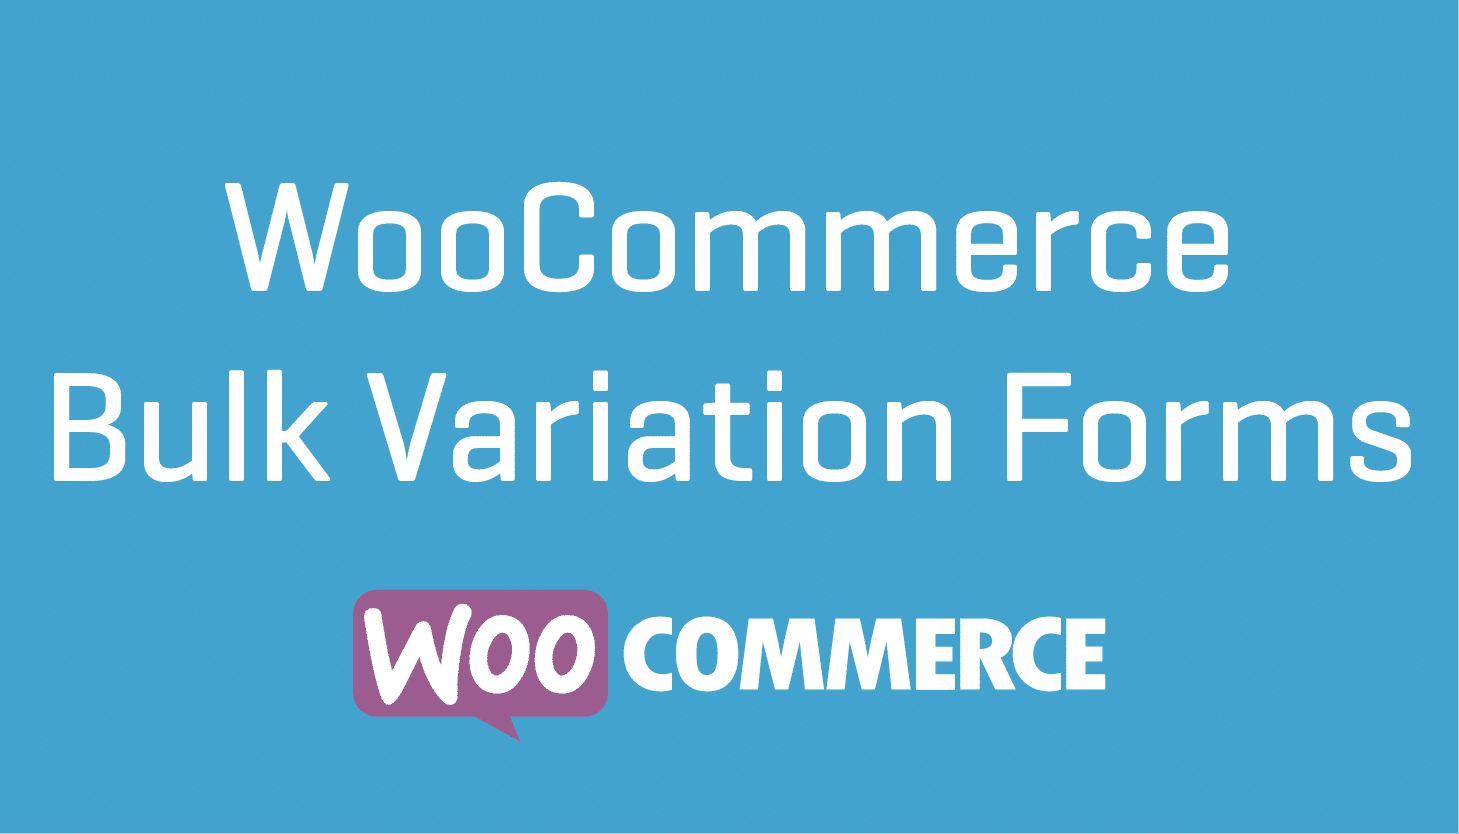 Bulk Variation Forms for WooCommerce 1.6.8